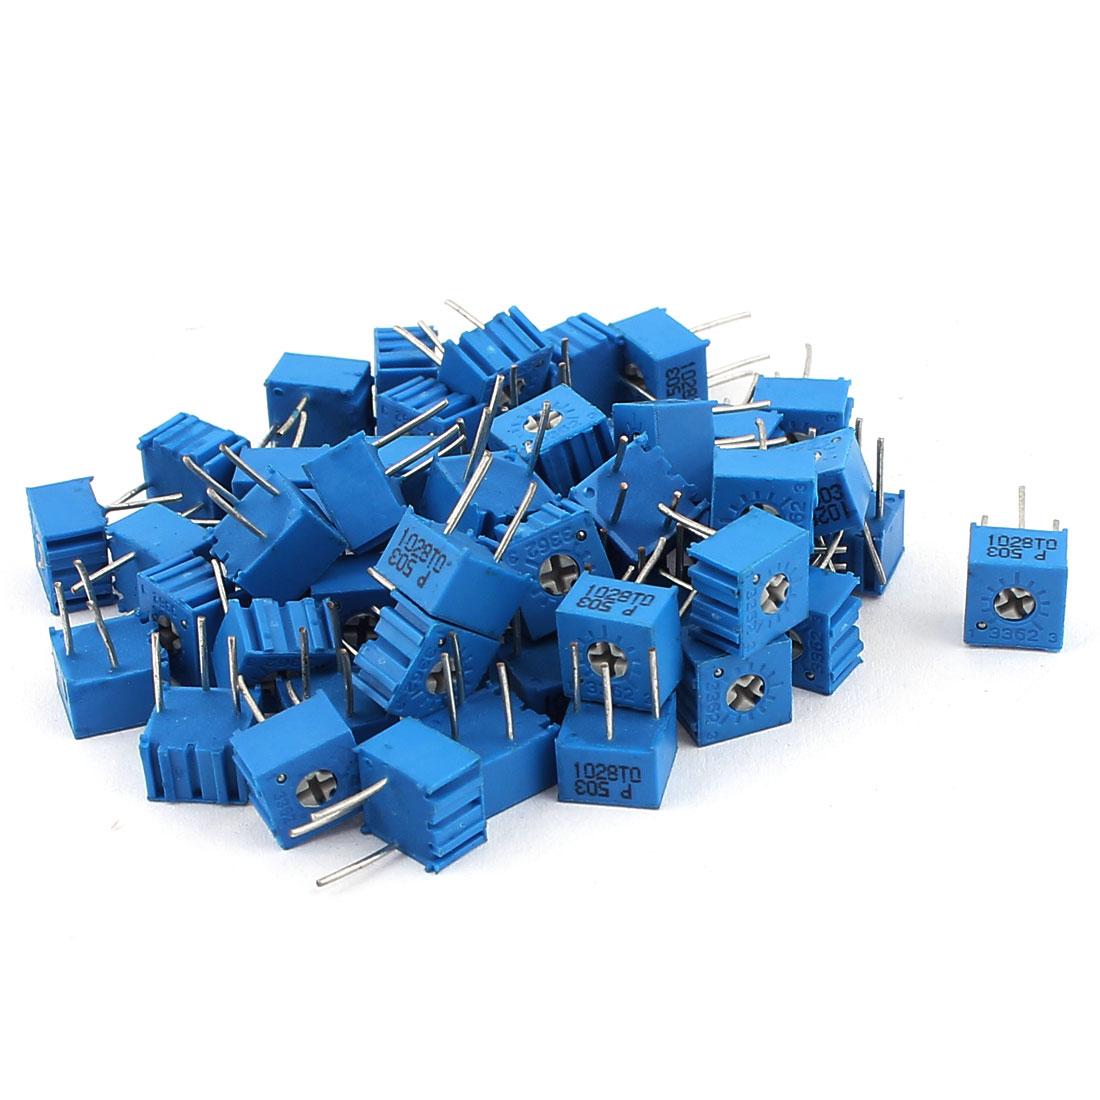 50Pcs Adjustable Potentiometer Trimmer Variable Resistor 3362P-503 50K Ohm